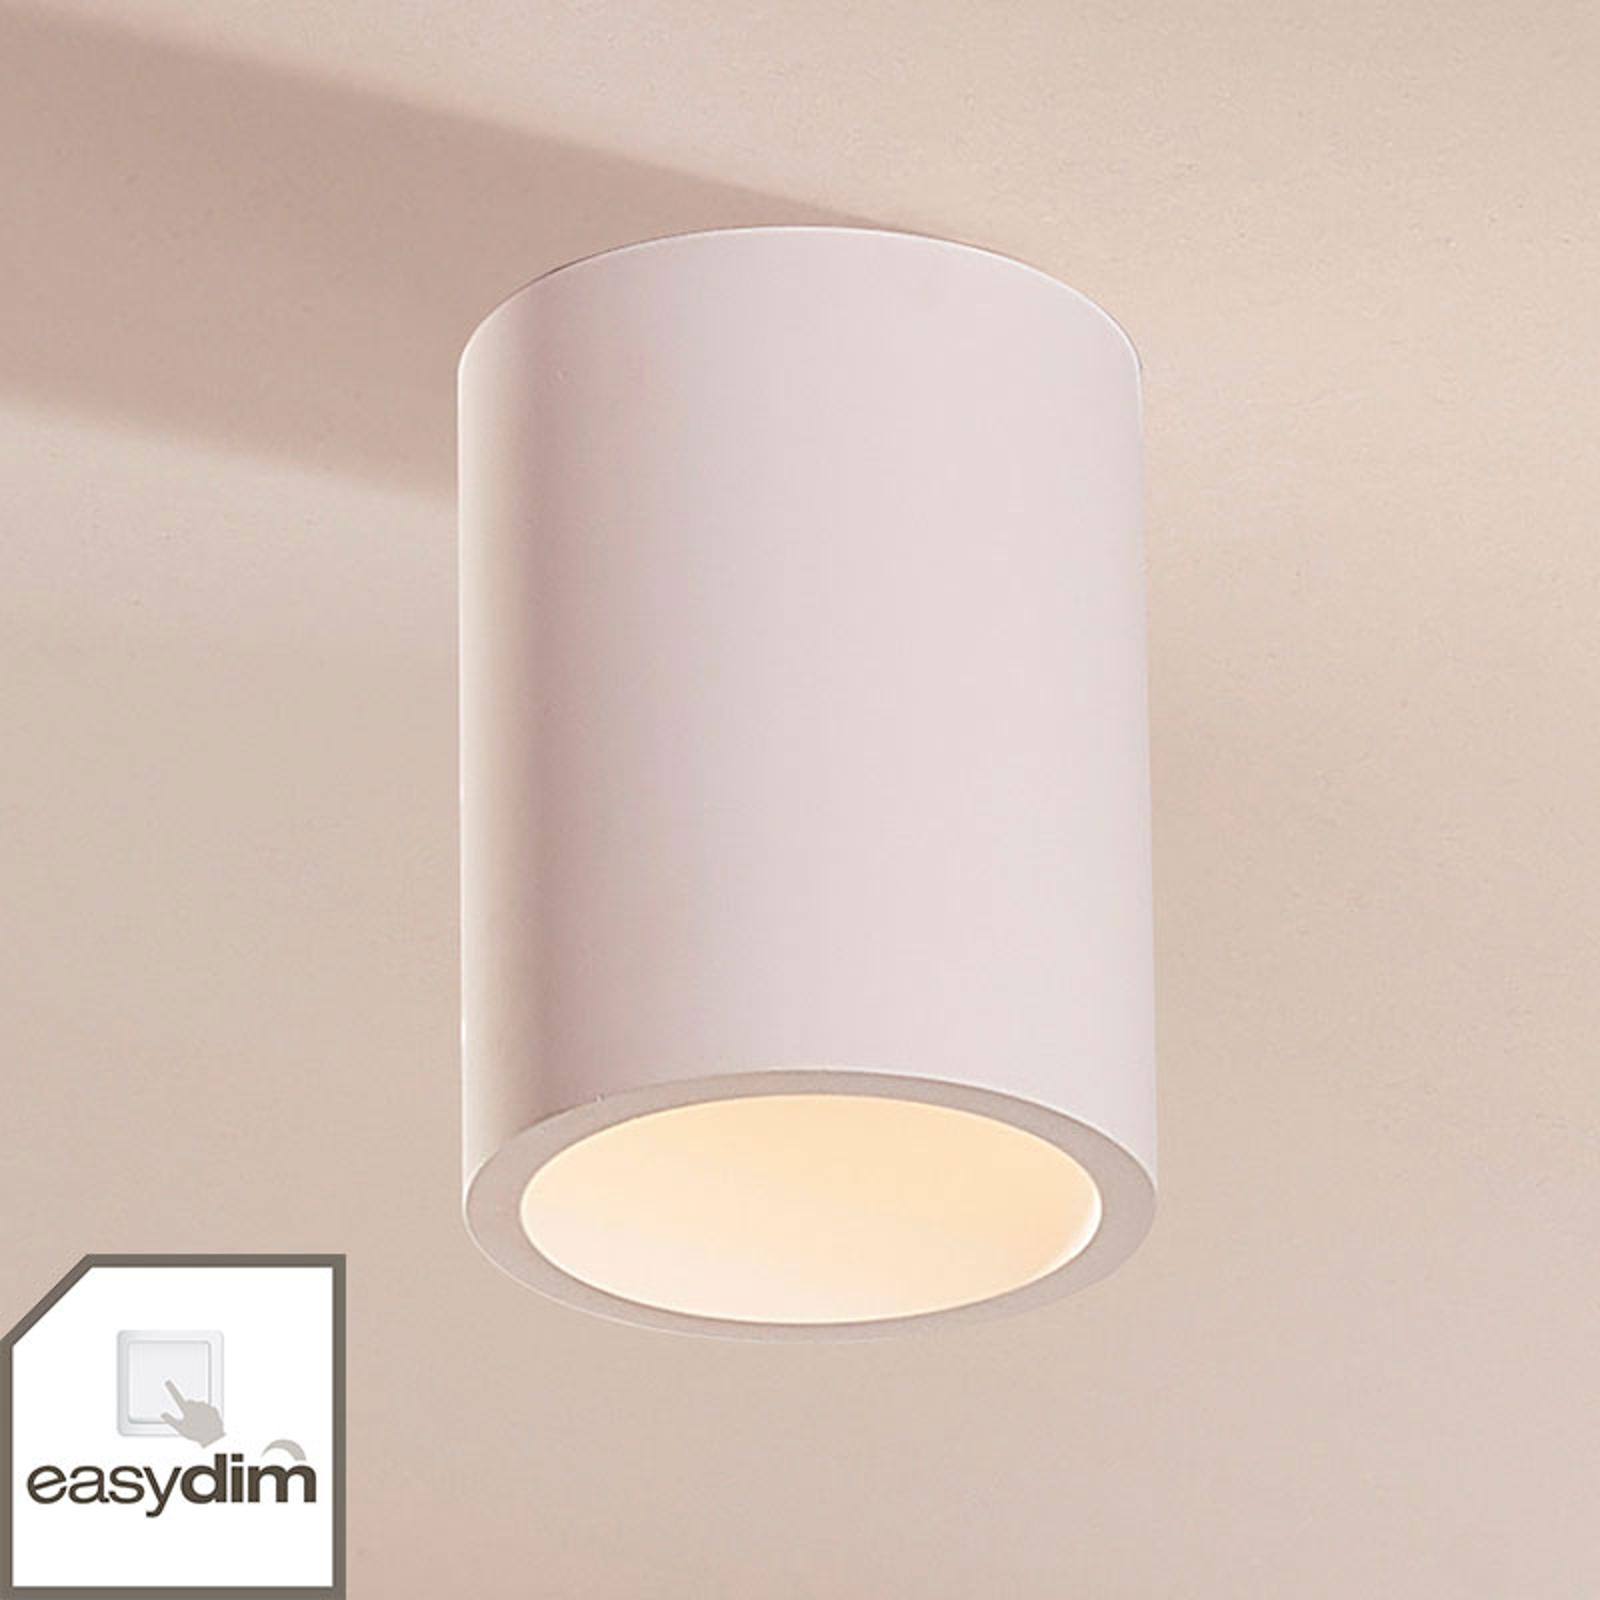 Rund Easydim-LED-taklampe Natalie i gips